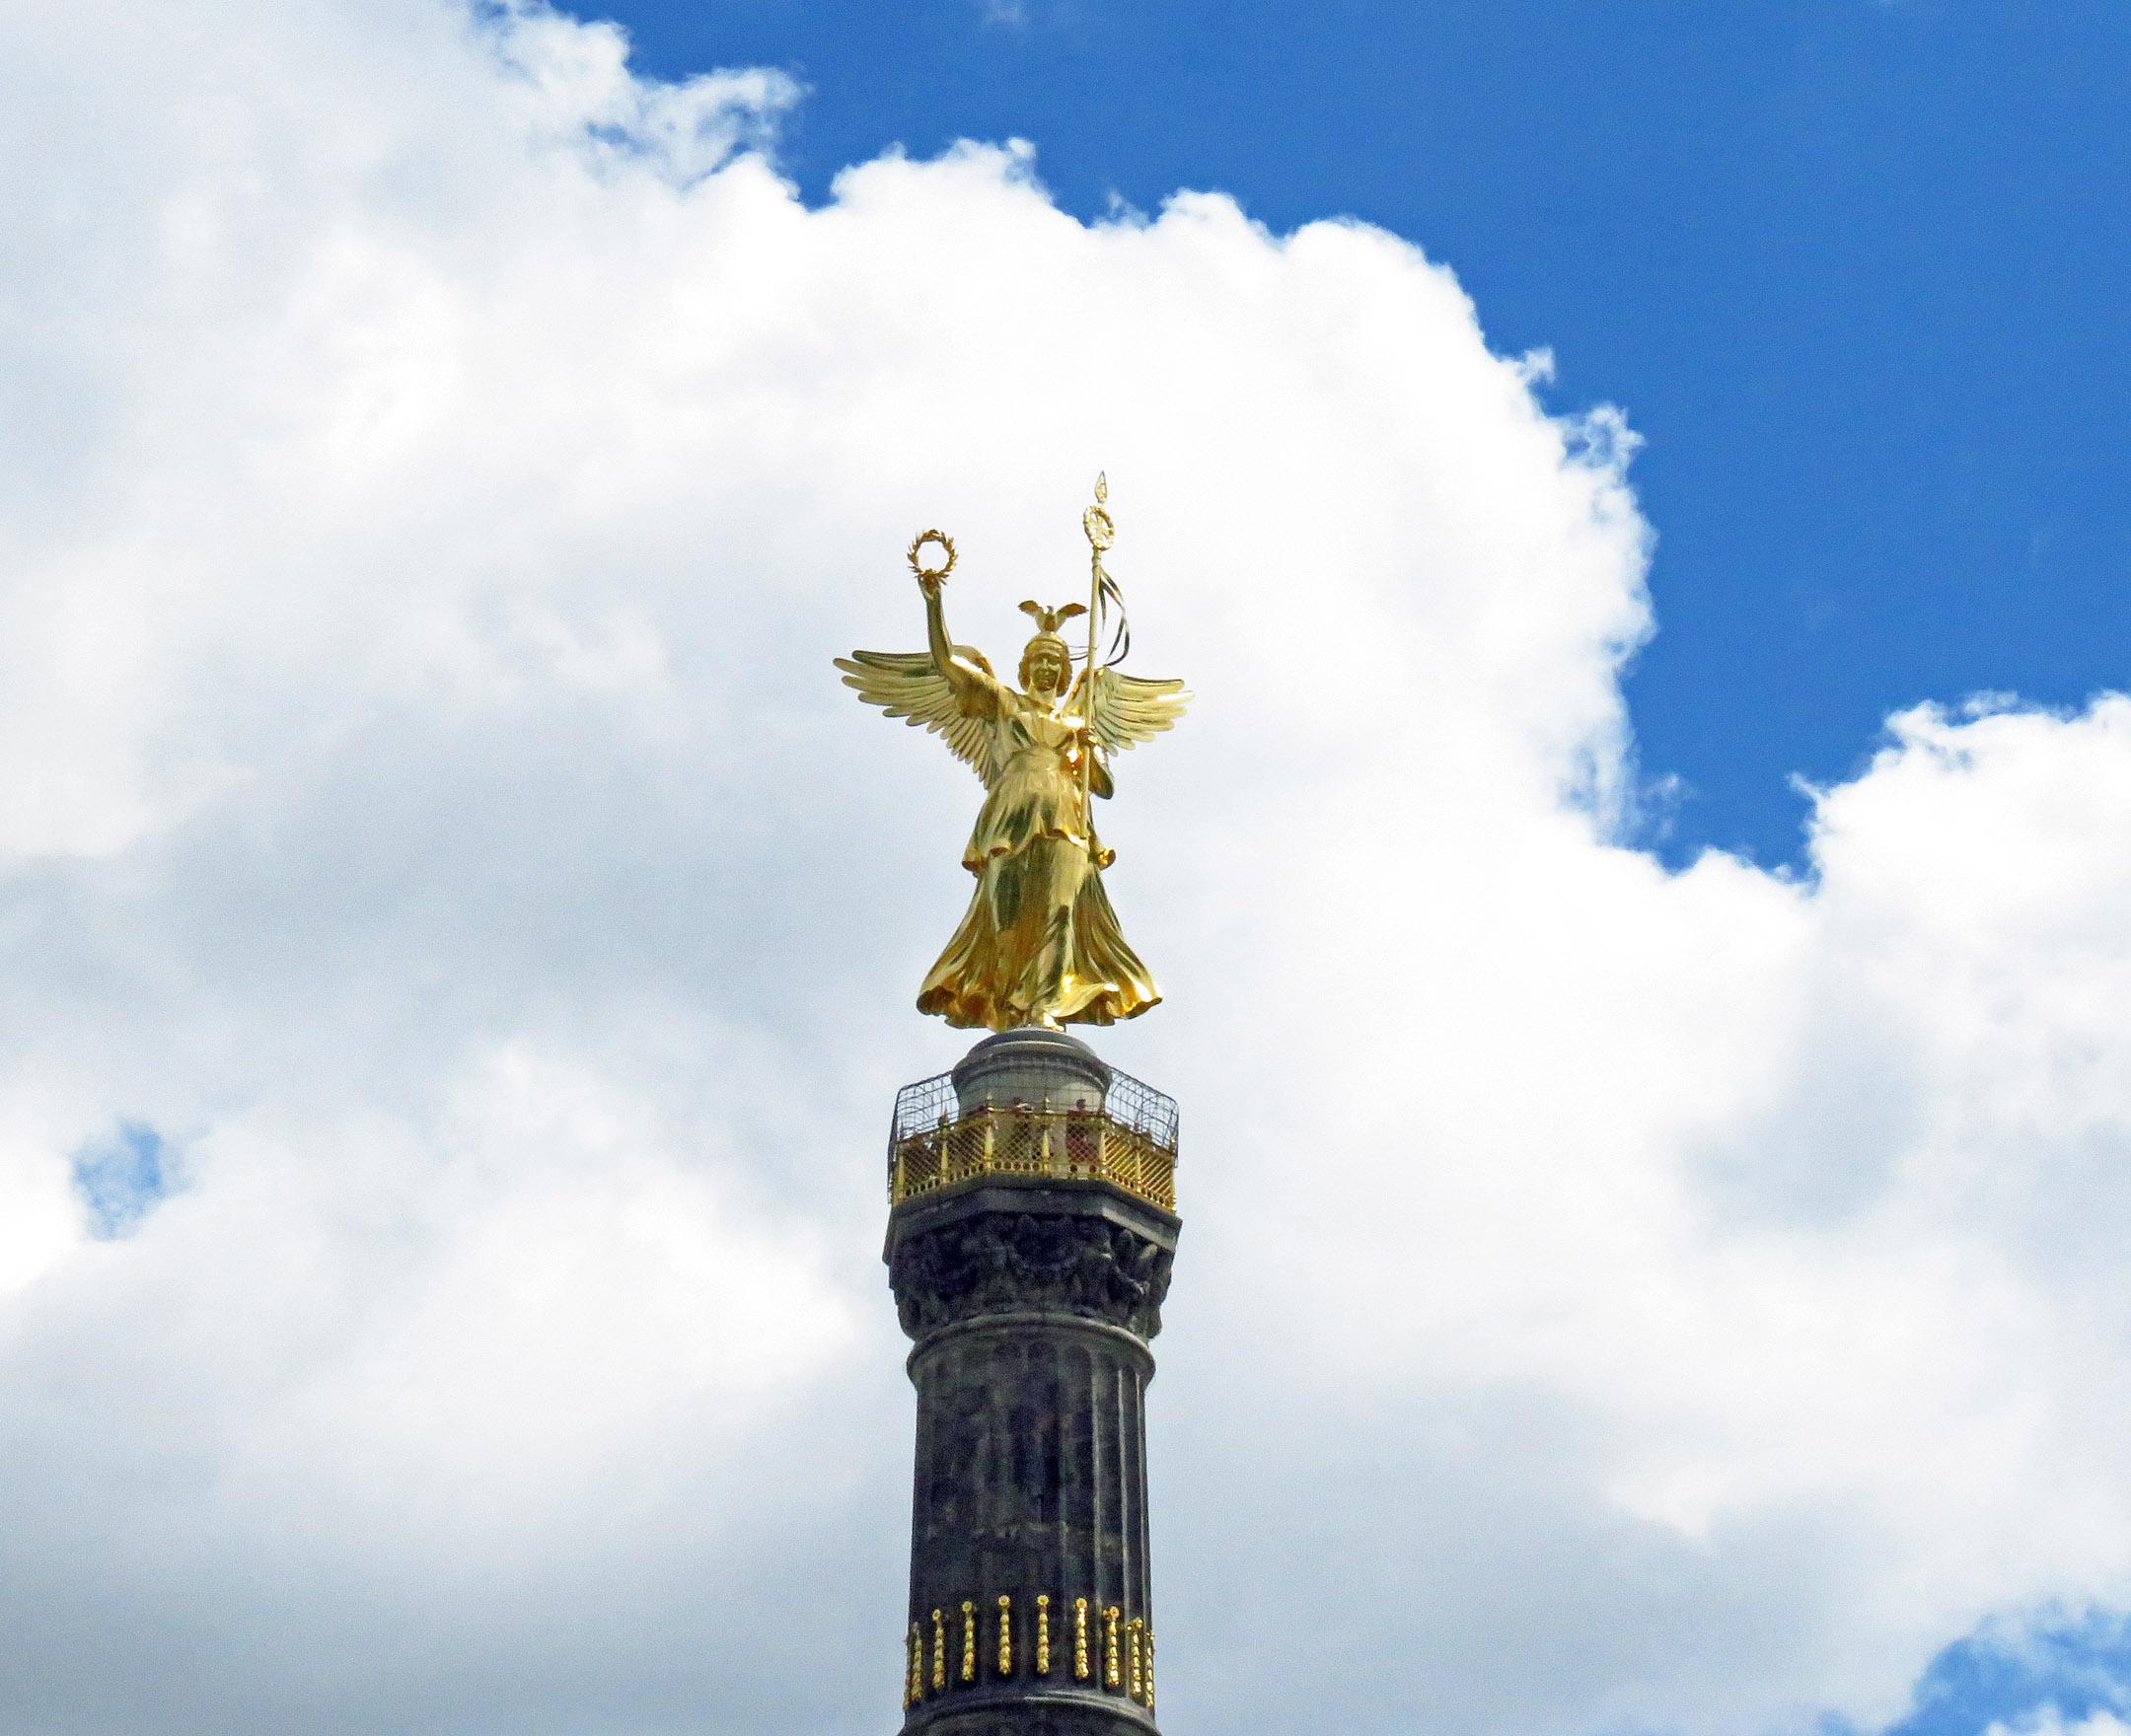 2. Victory Column